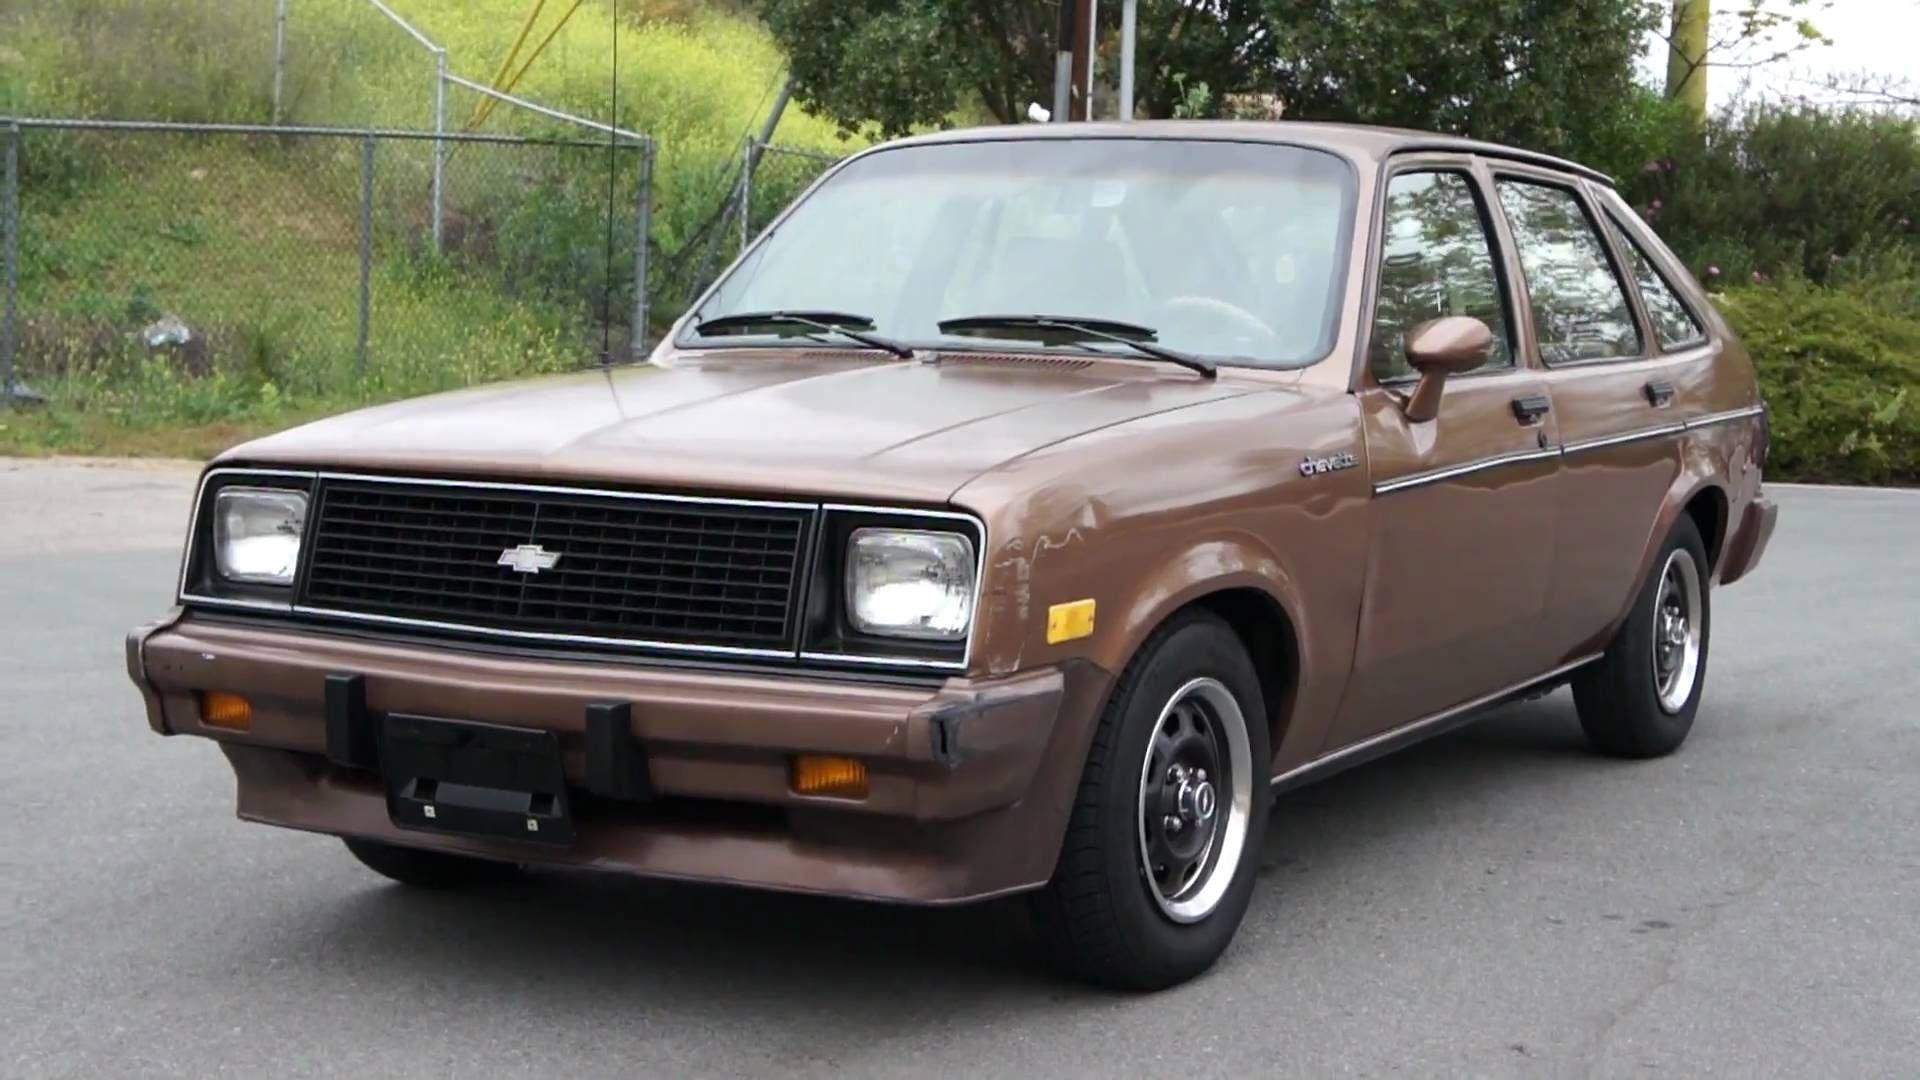 Brown Chevy Chevette Brown Cars Pinterest